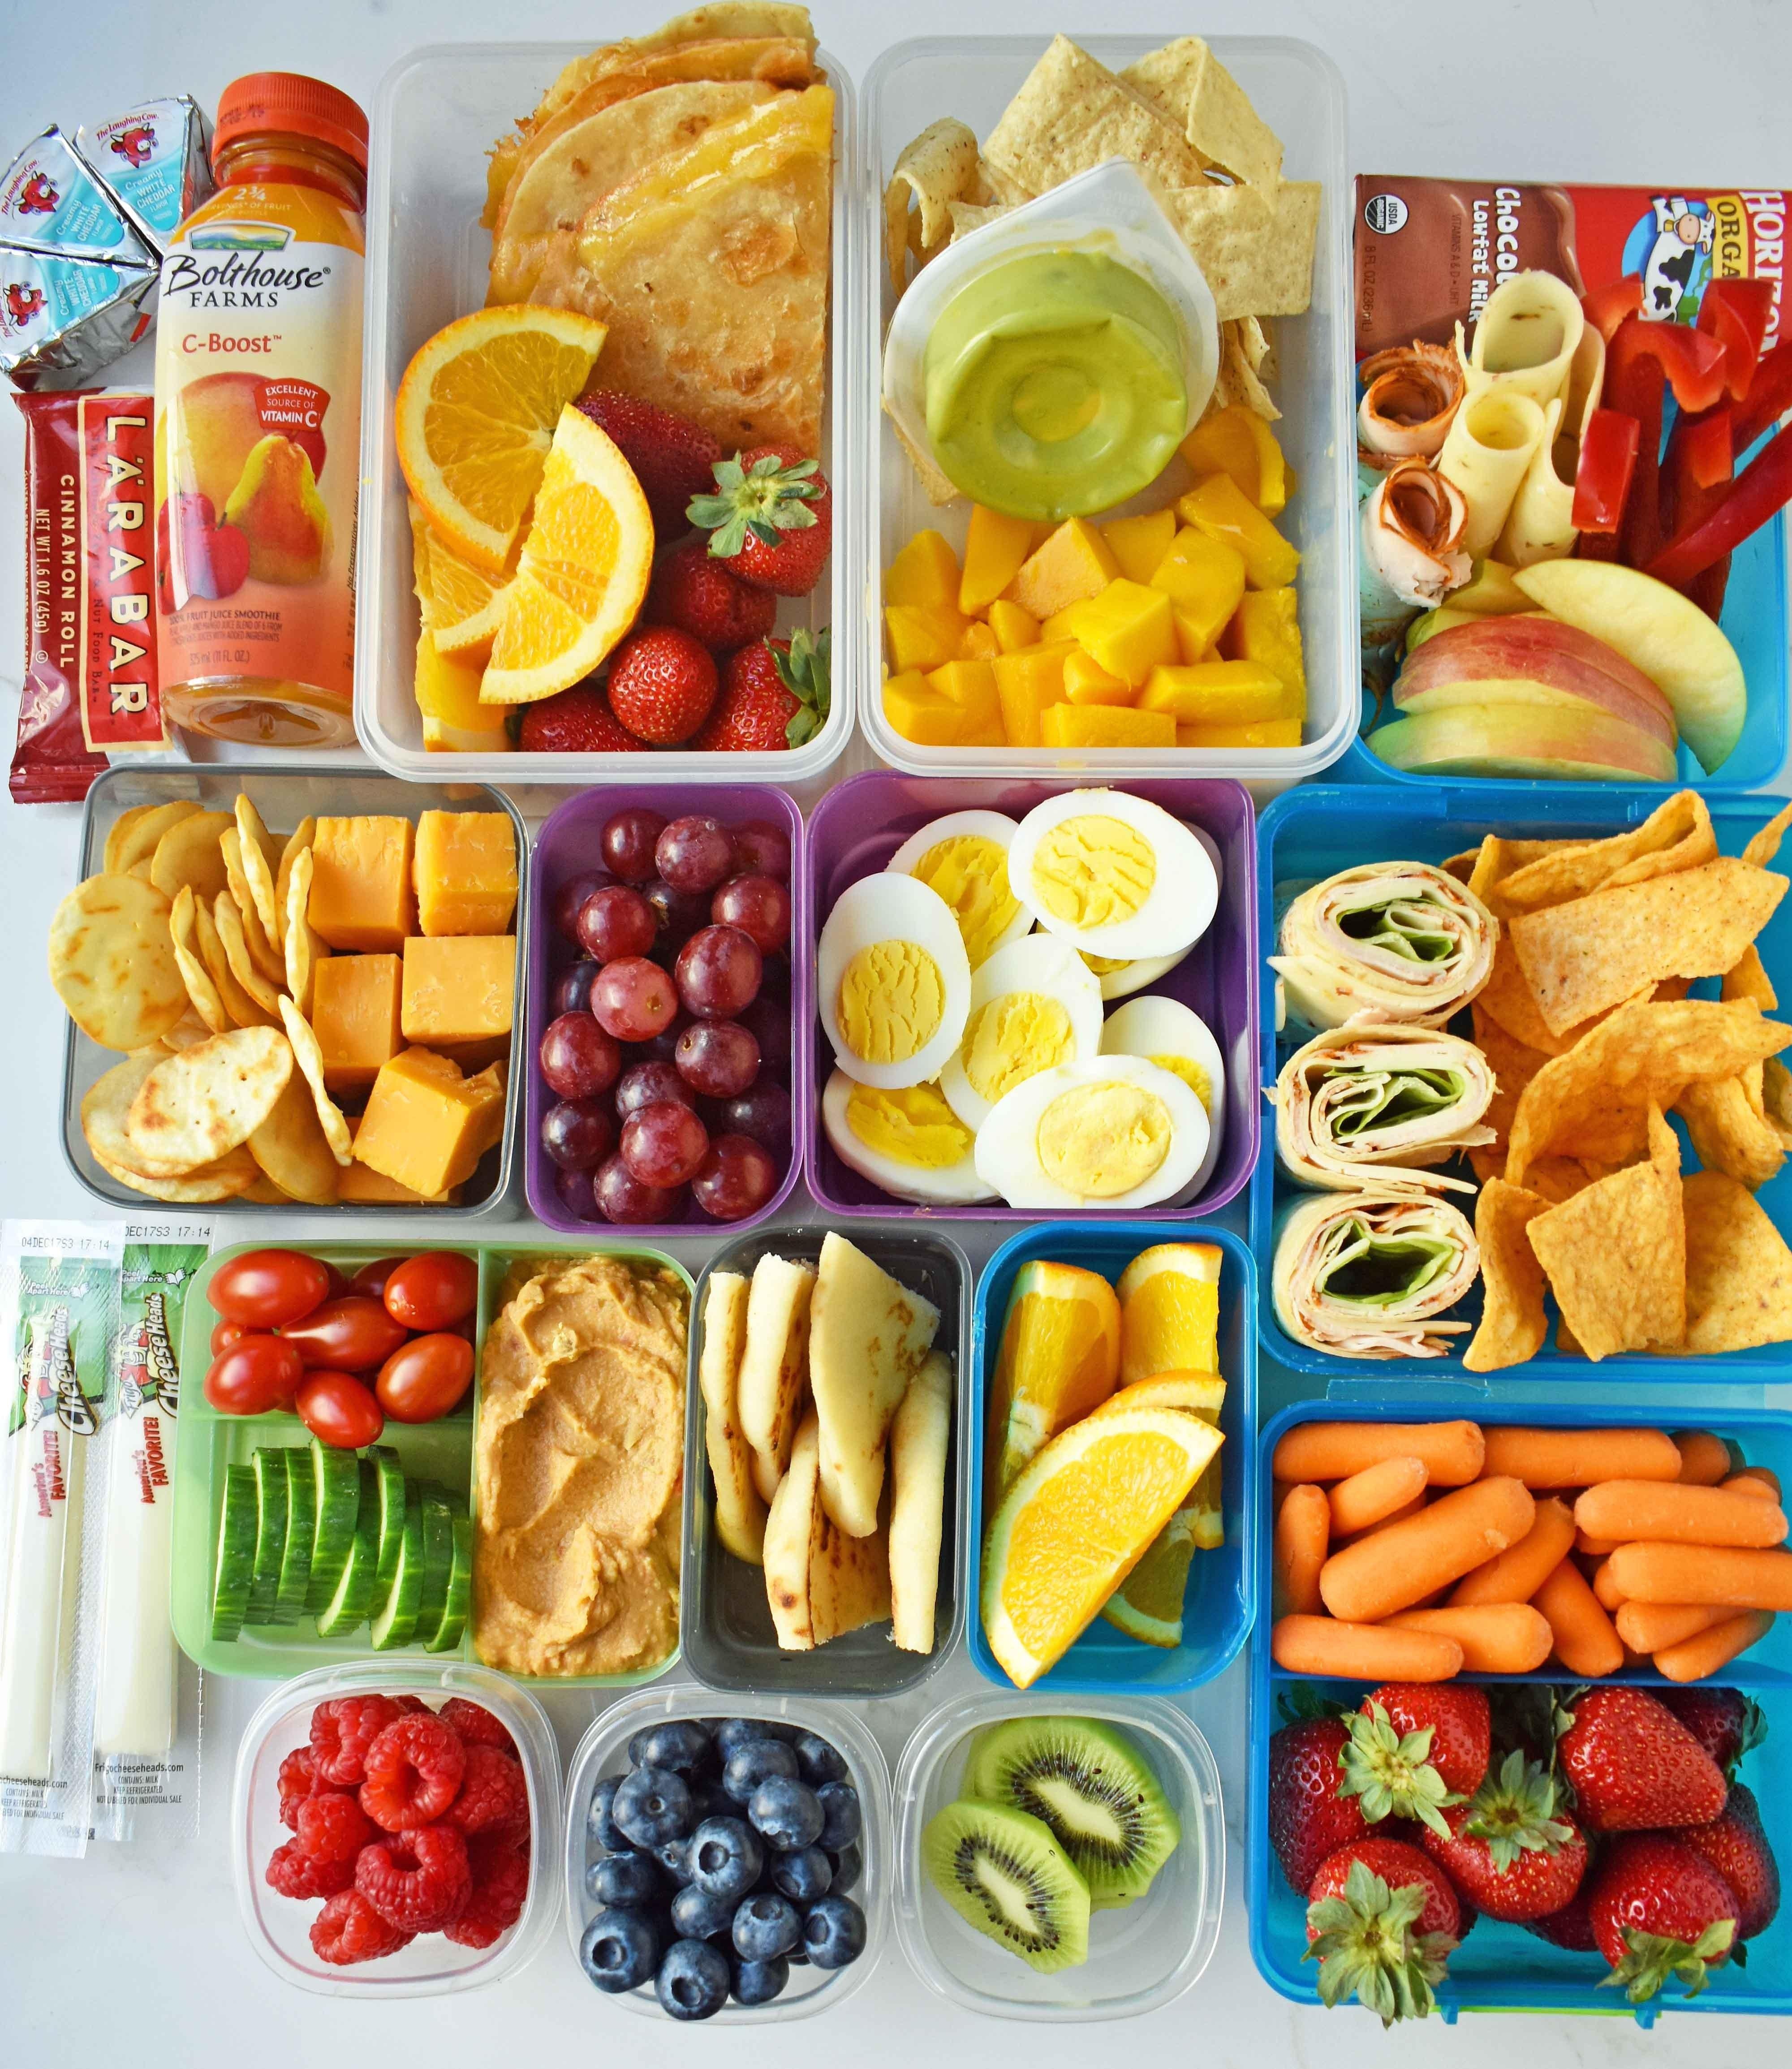 10 Great School Lunch Ideas For High Schoolers back to school kids lunch ideas modern honey 22